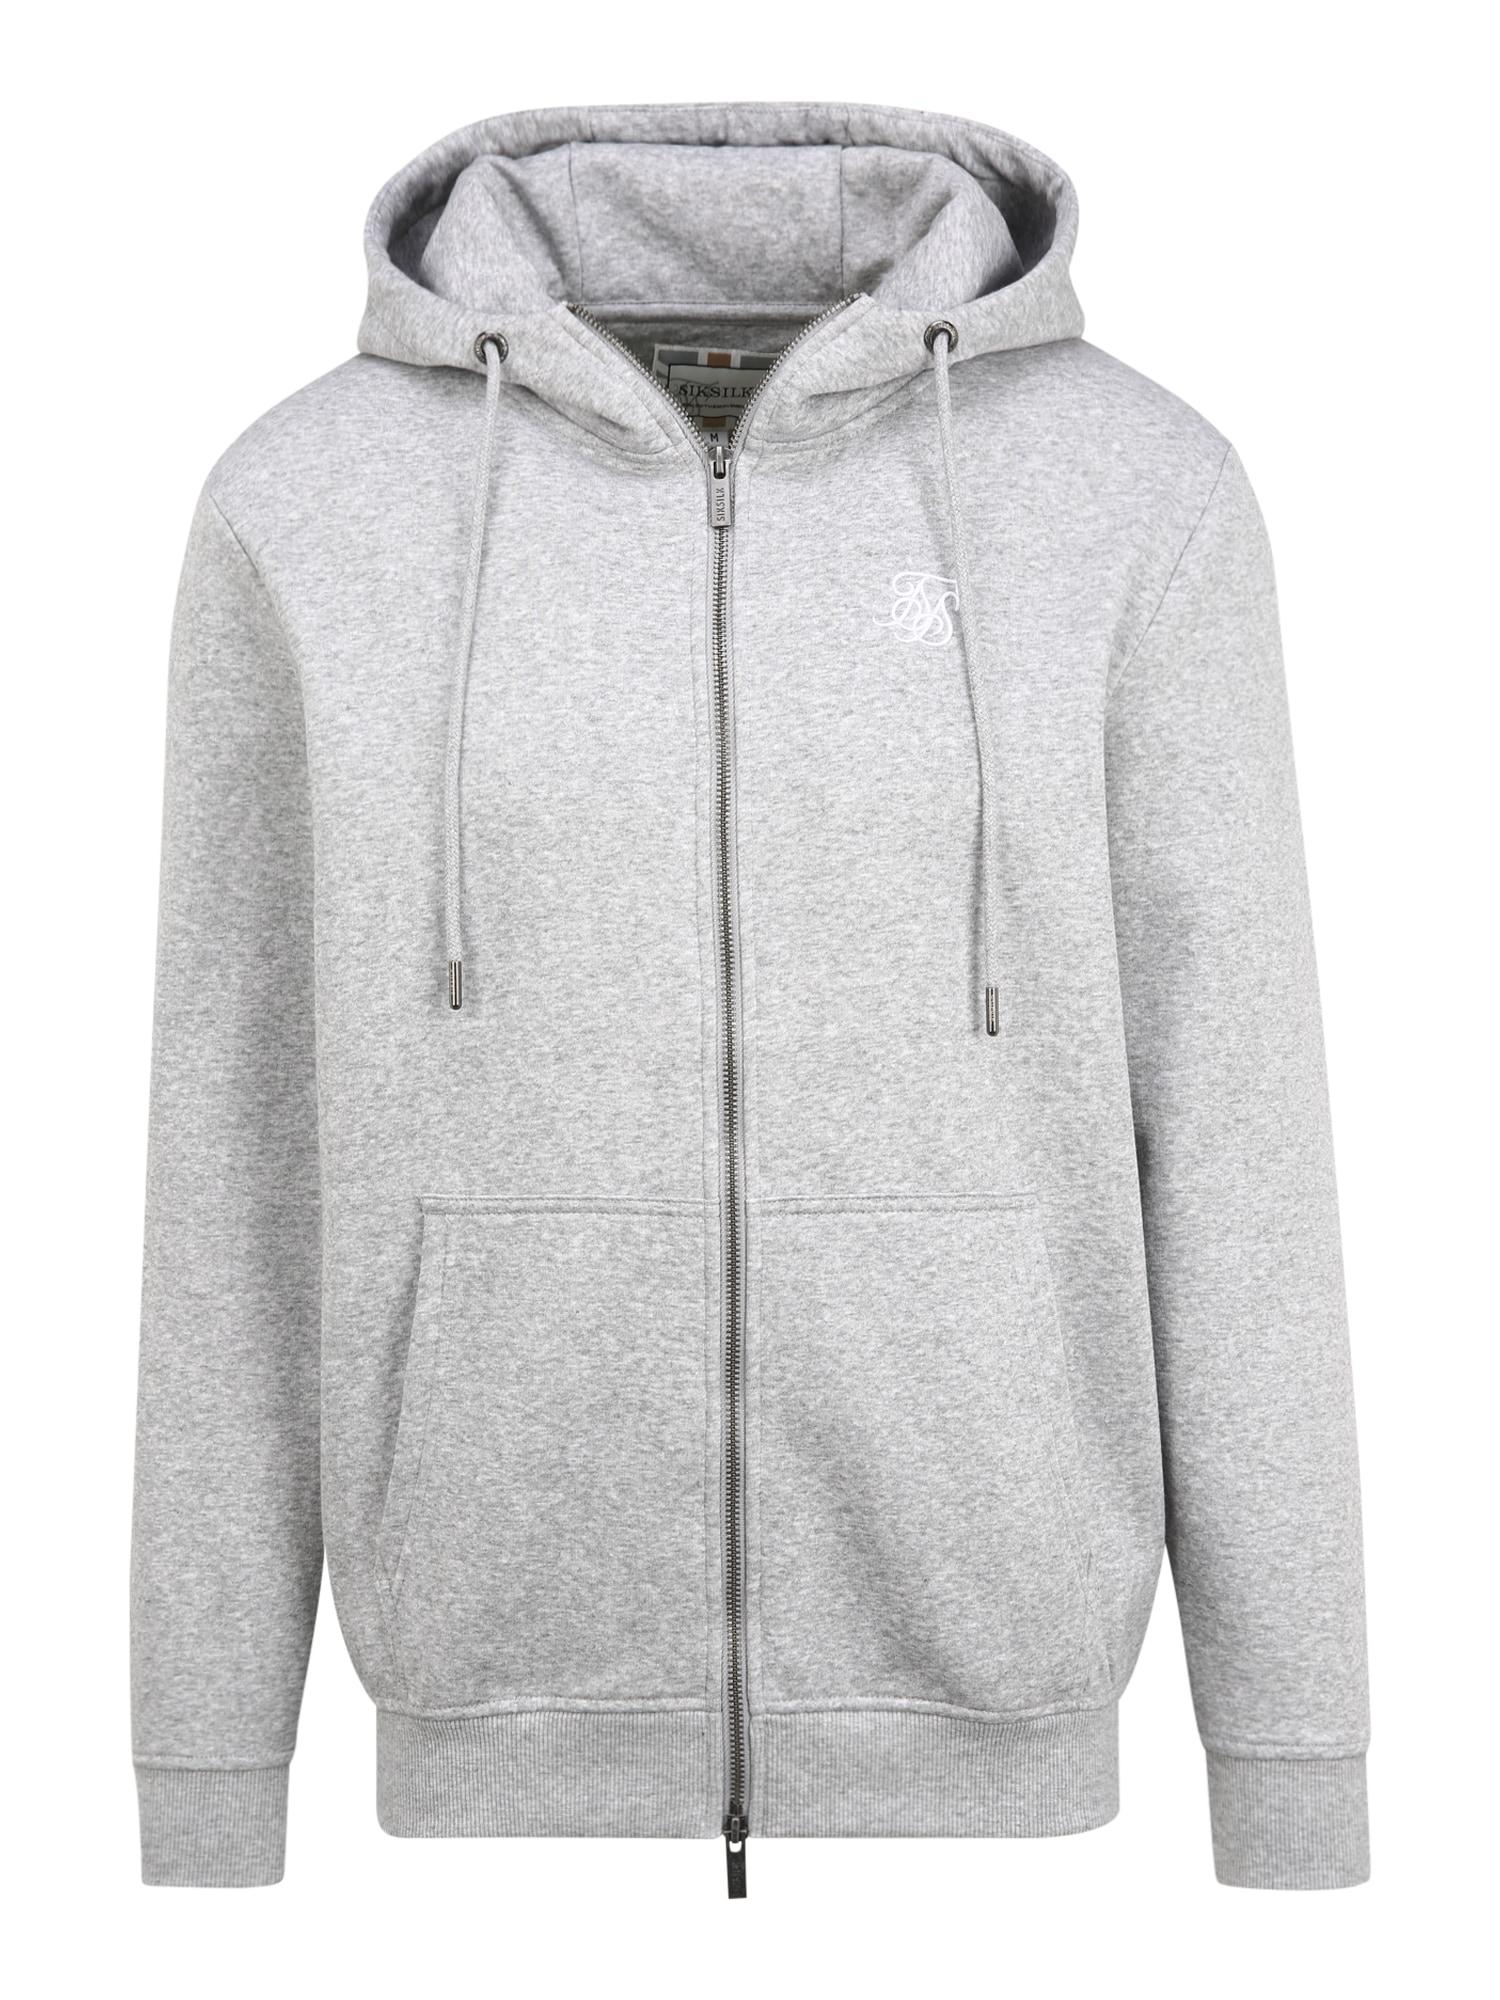 SikSilk Džemperis margai pilka / balta